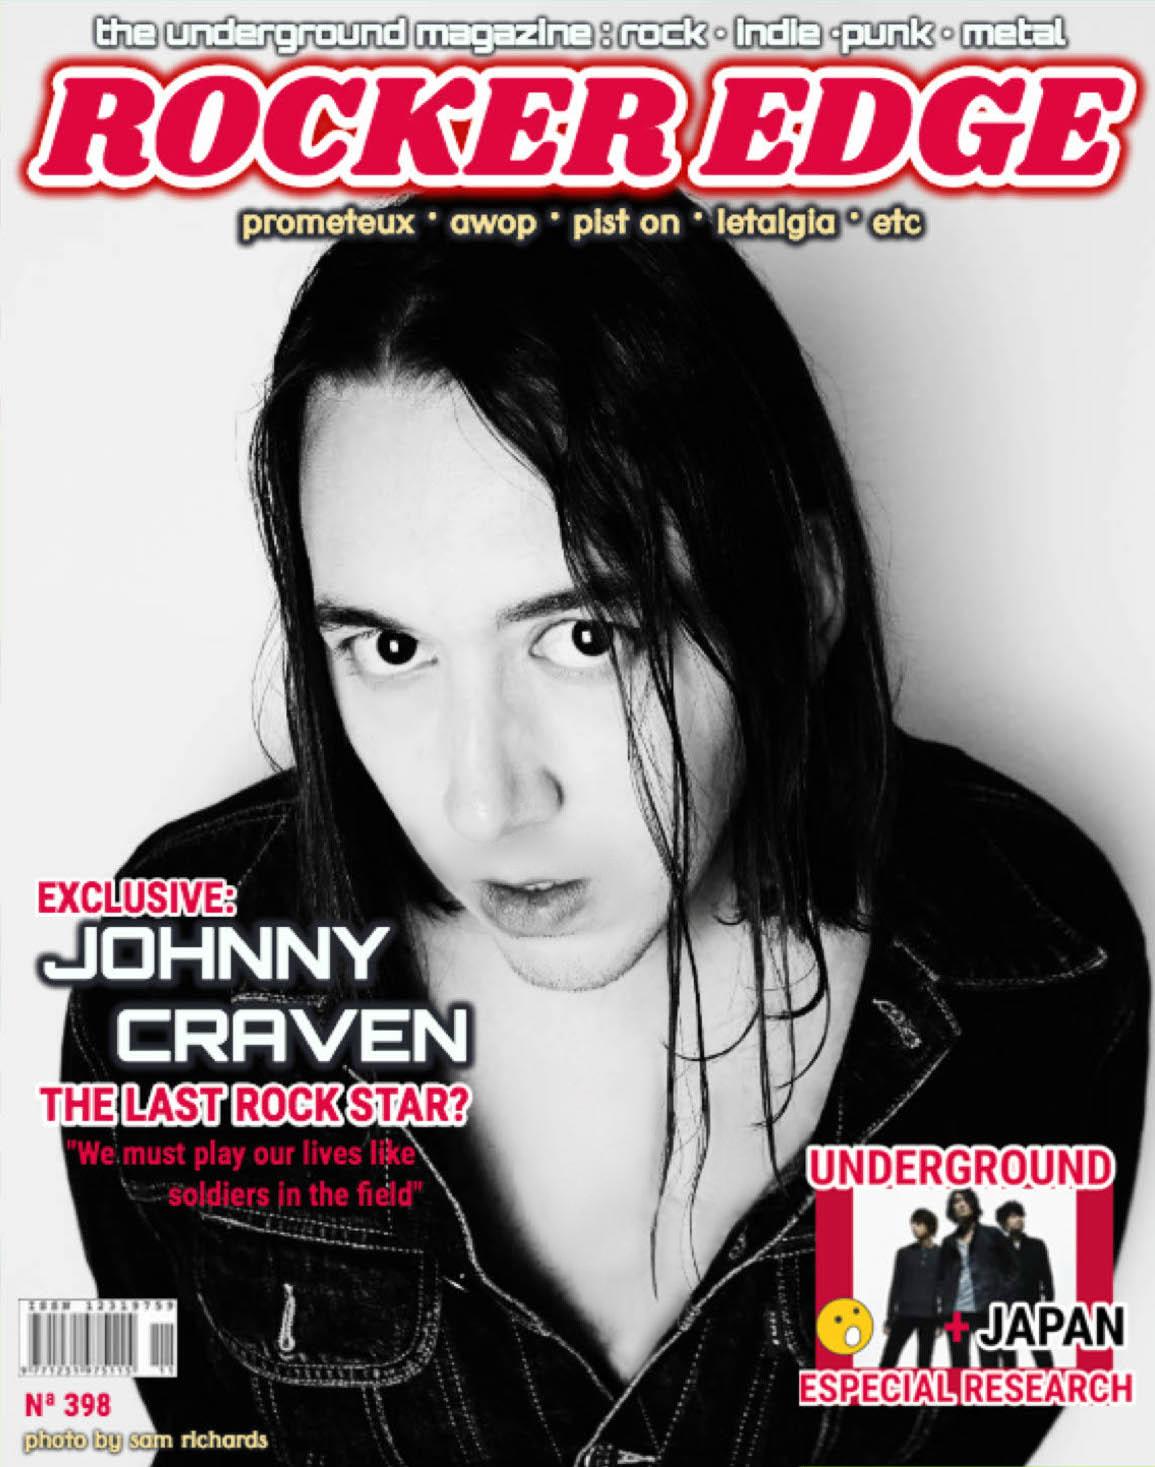 Johnny Craven @ The Rocker Edge